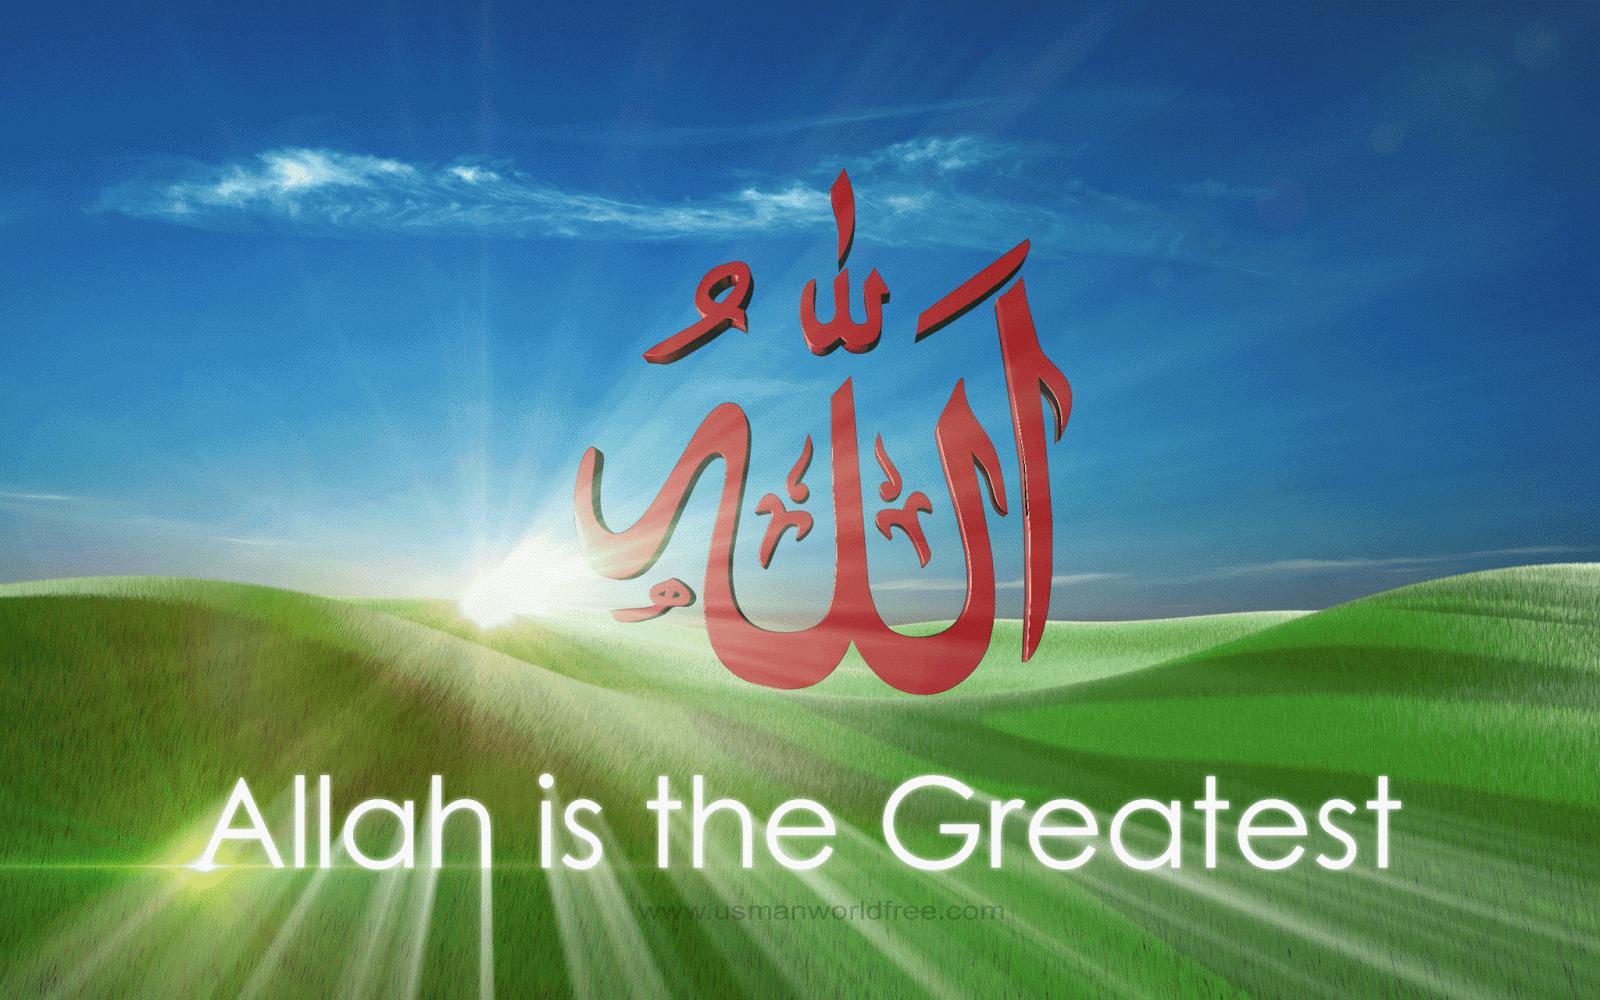 Wallpapers E Islamic E Beautiful Name Allah High Quality Allah Wallpaper Free Download 1600x1000 Wallpaper Teahub Io